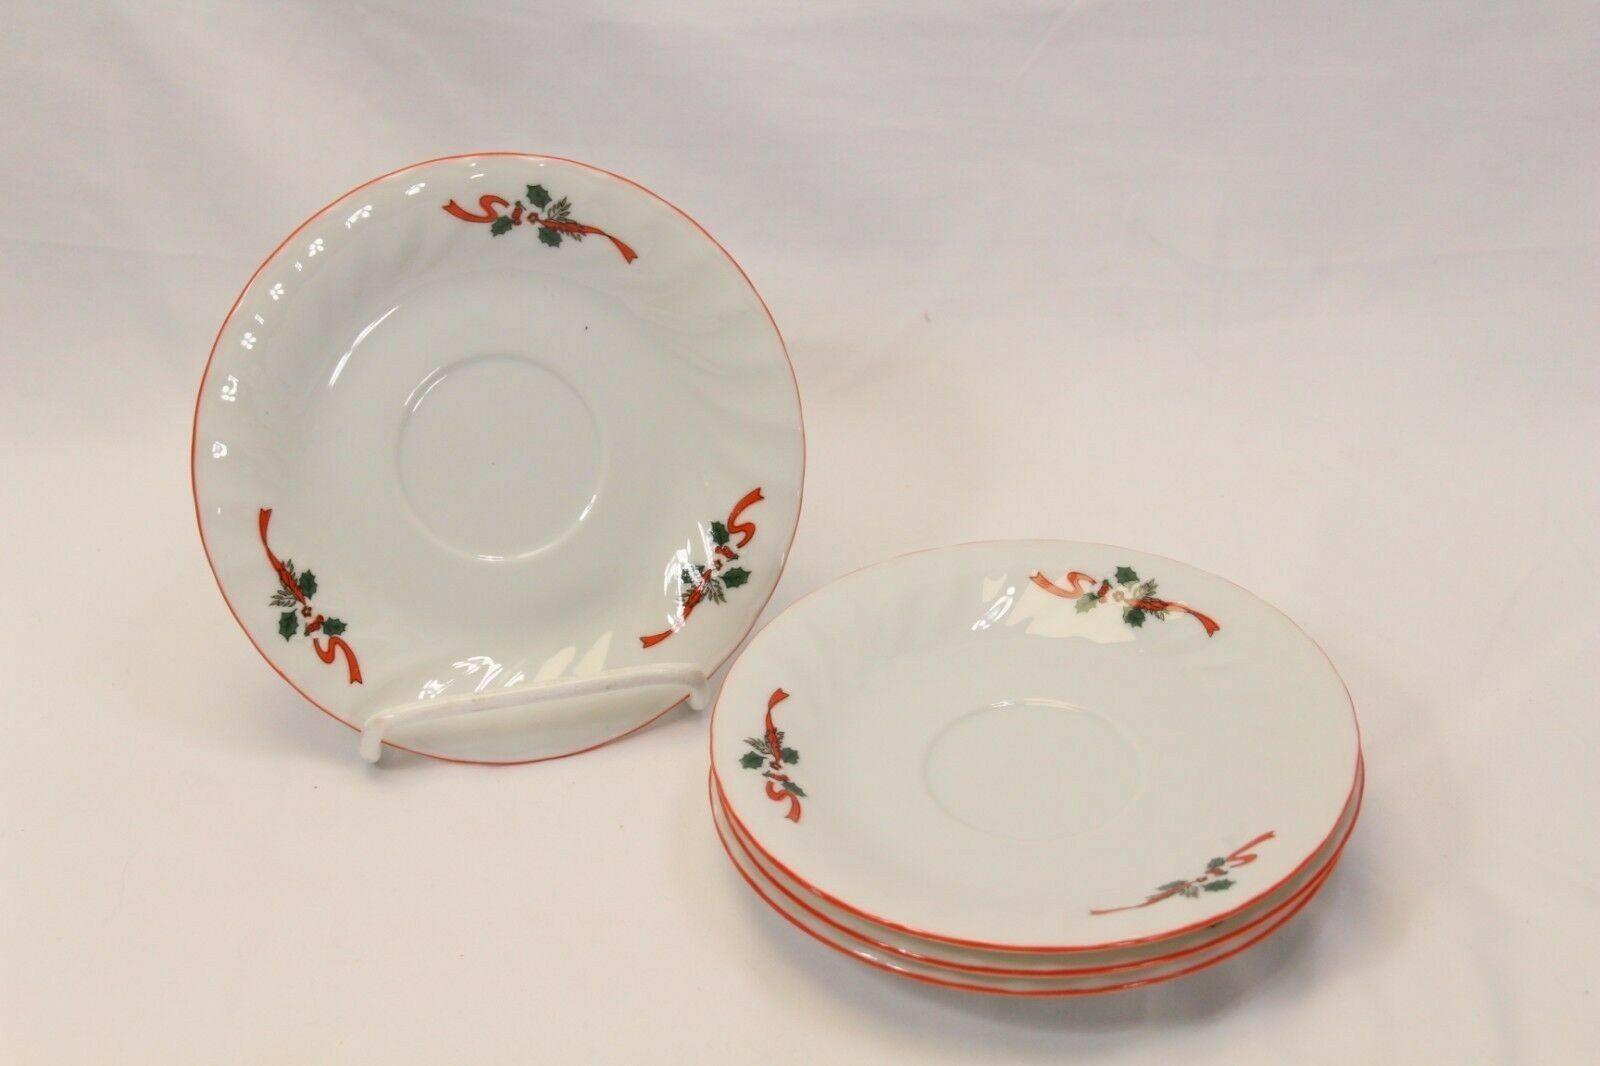 Kopin Xmas Pleasure Dinner Plates Scalloped Rim Lot of 16 image 8